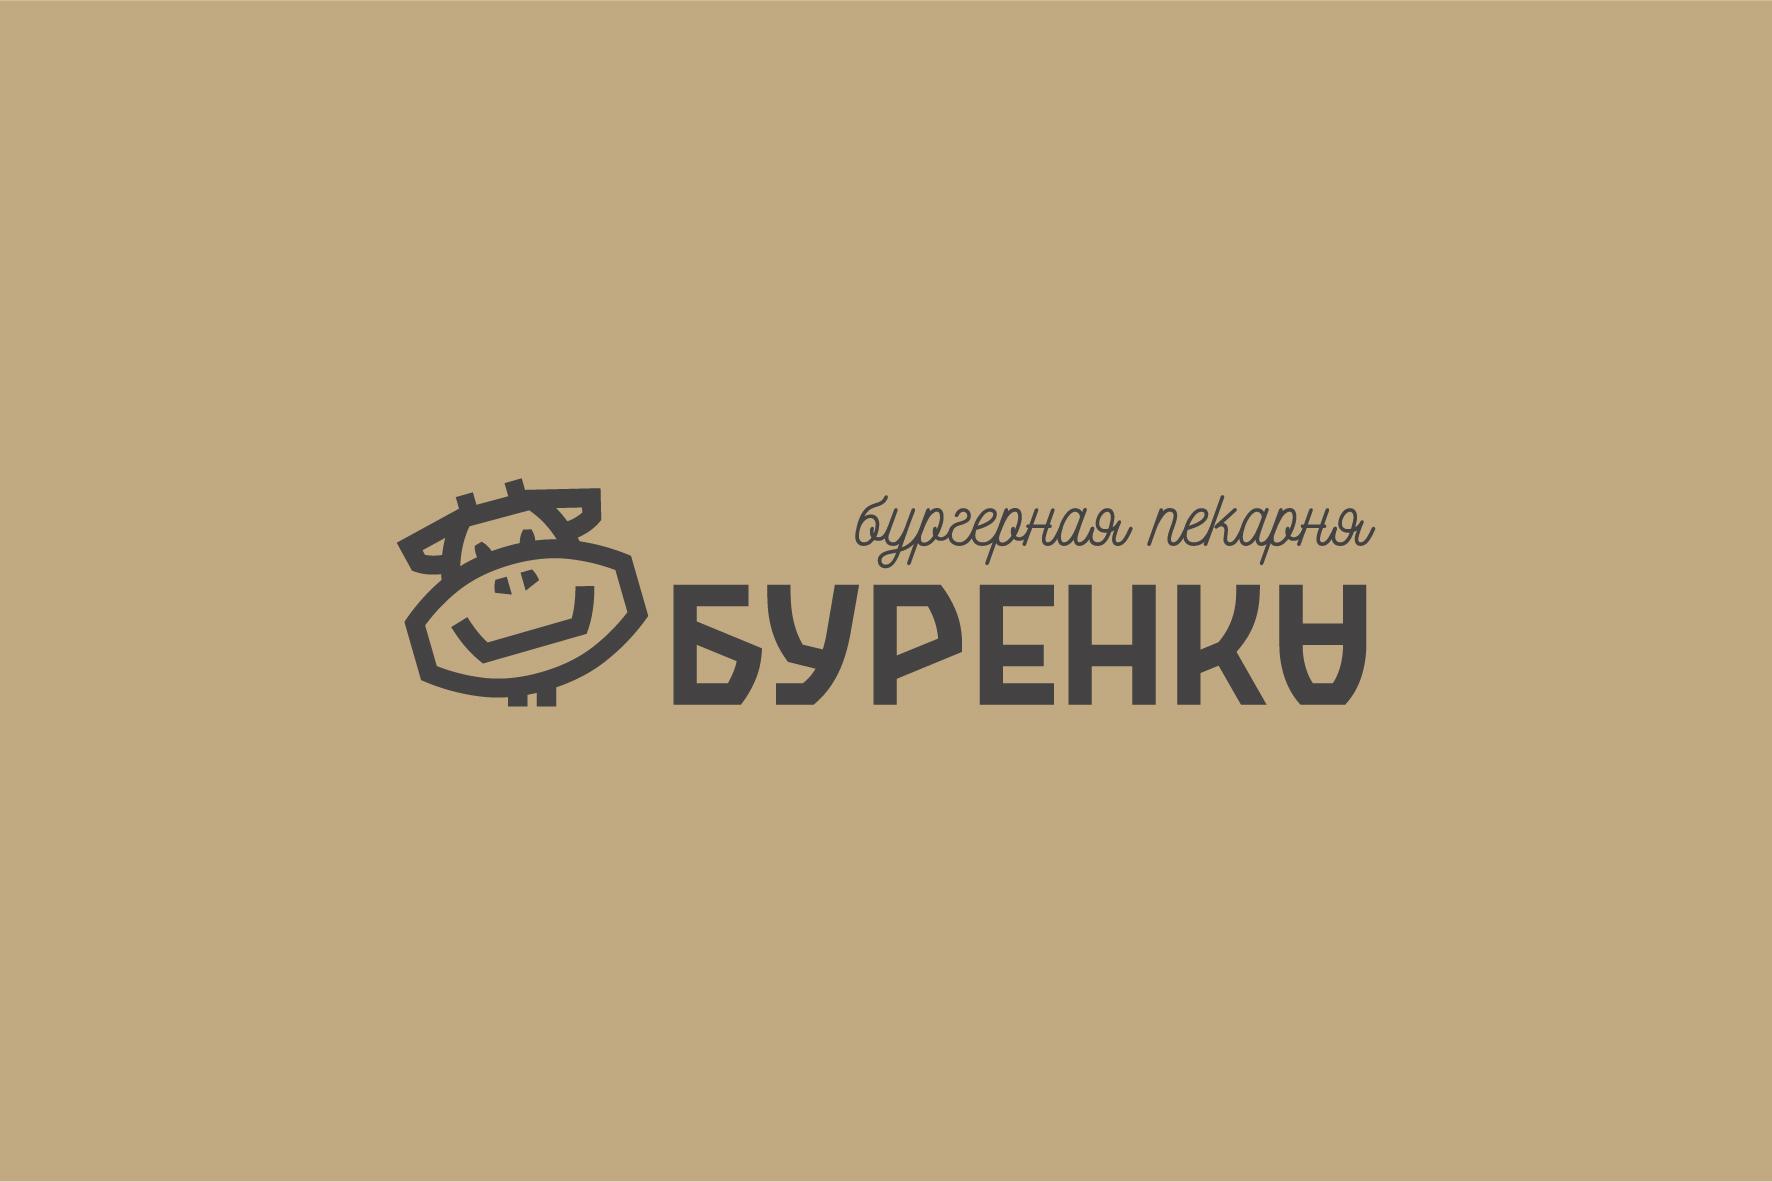 Логотип для Бургерной с Пекарней фото f_0535e151e8851679.jpg